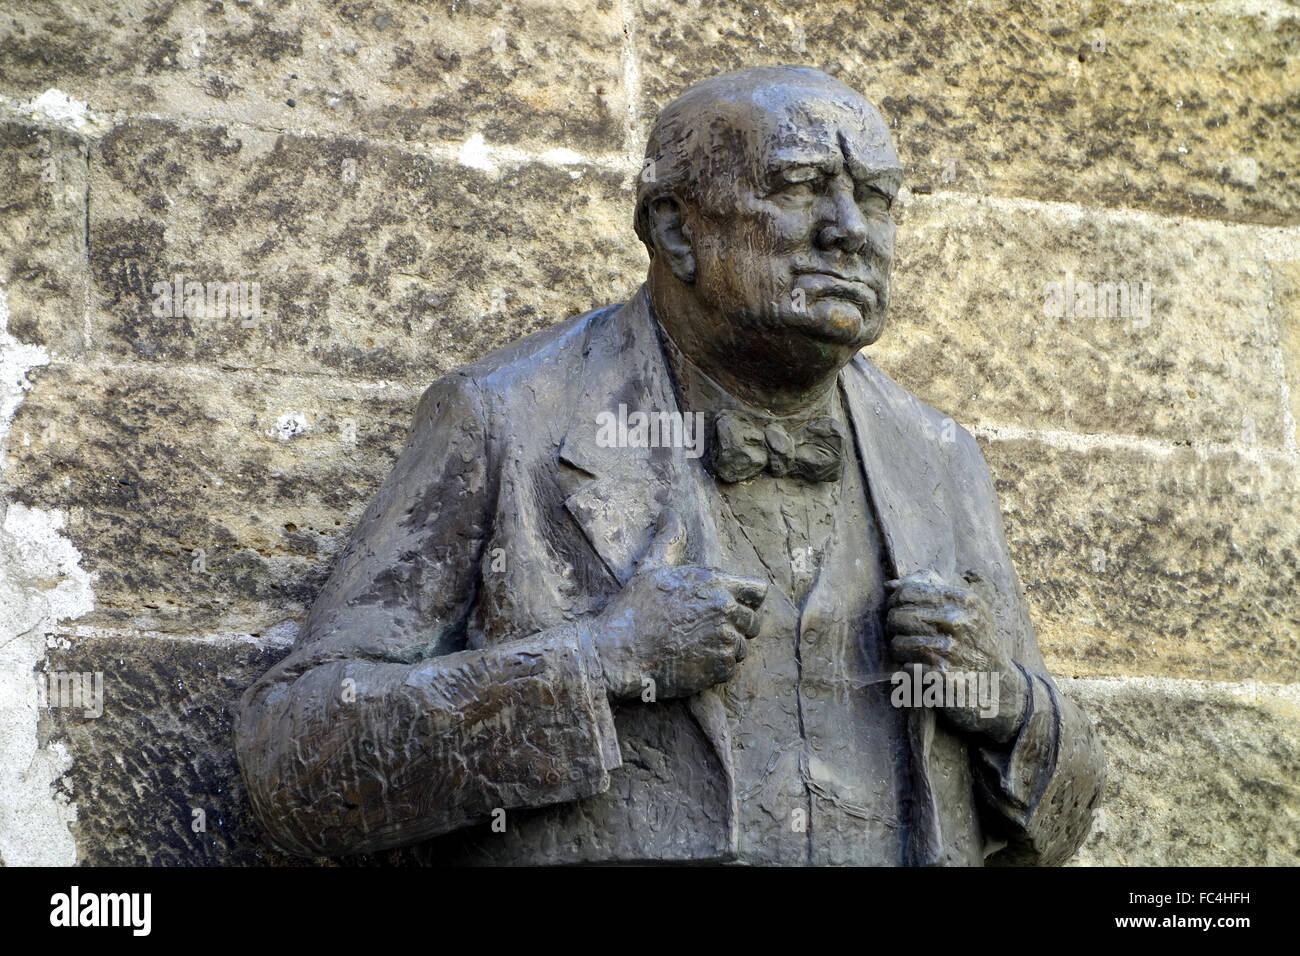 Sir Winston Leonard Spencer-Churchill - Stock Image